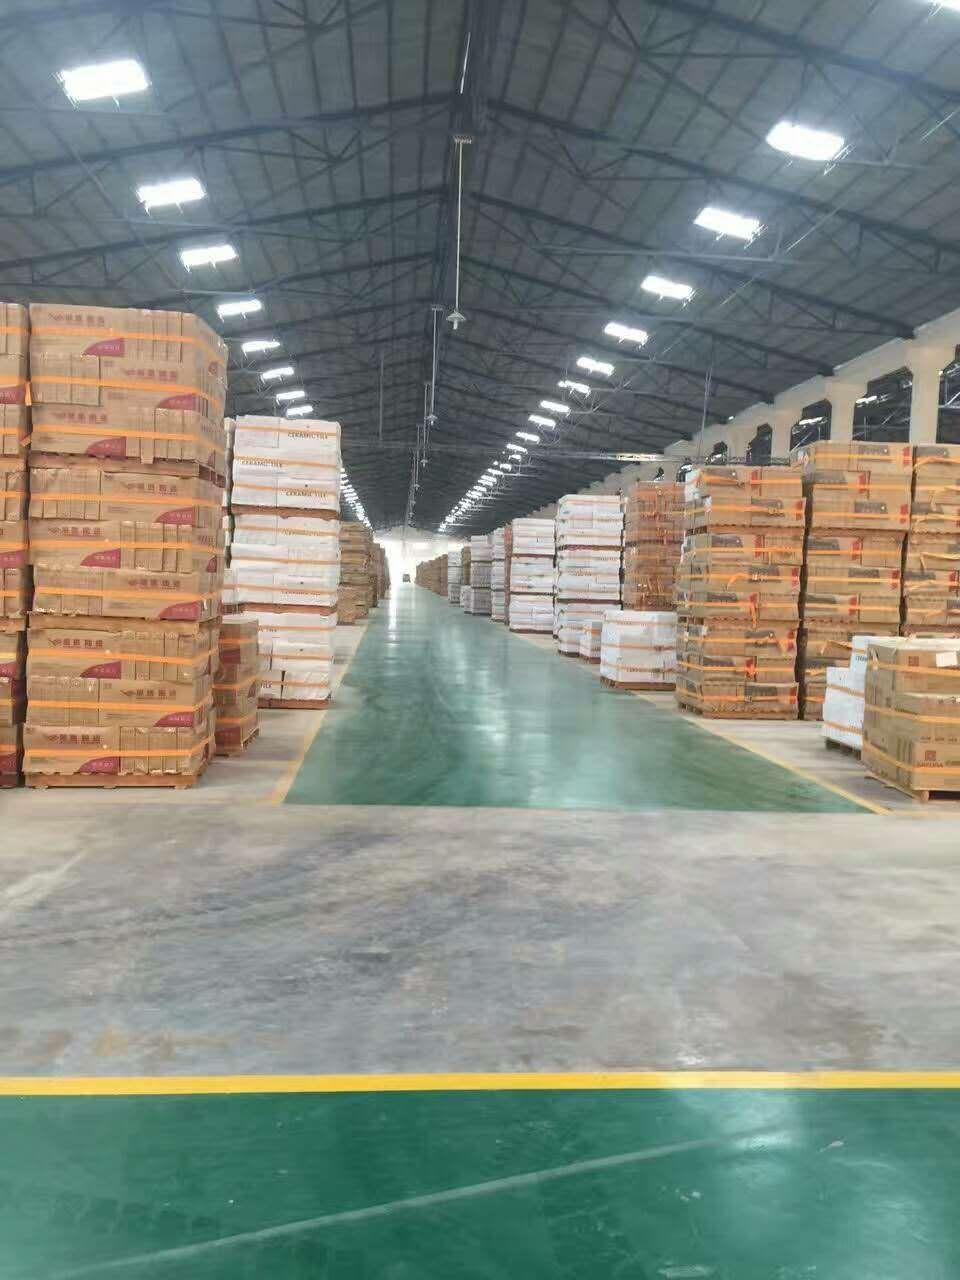 Porcelain And Ceramic Tiles Warehouse Of Foshan Bovies